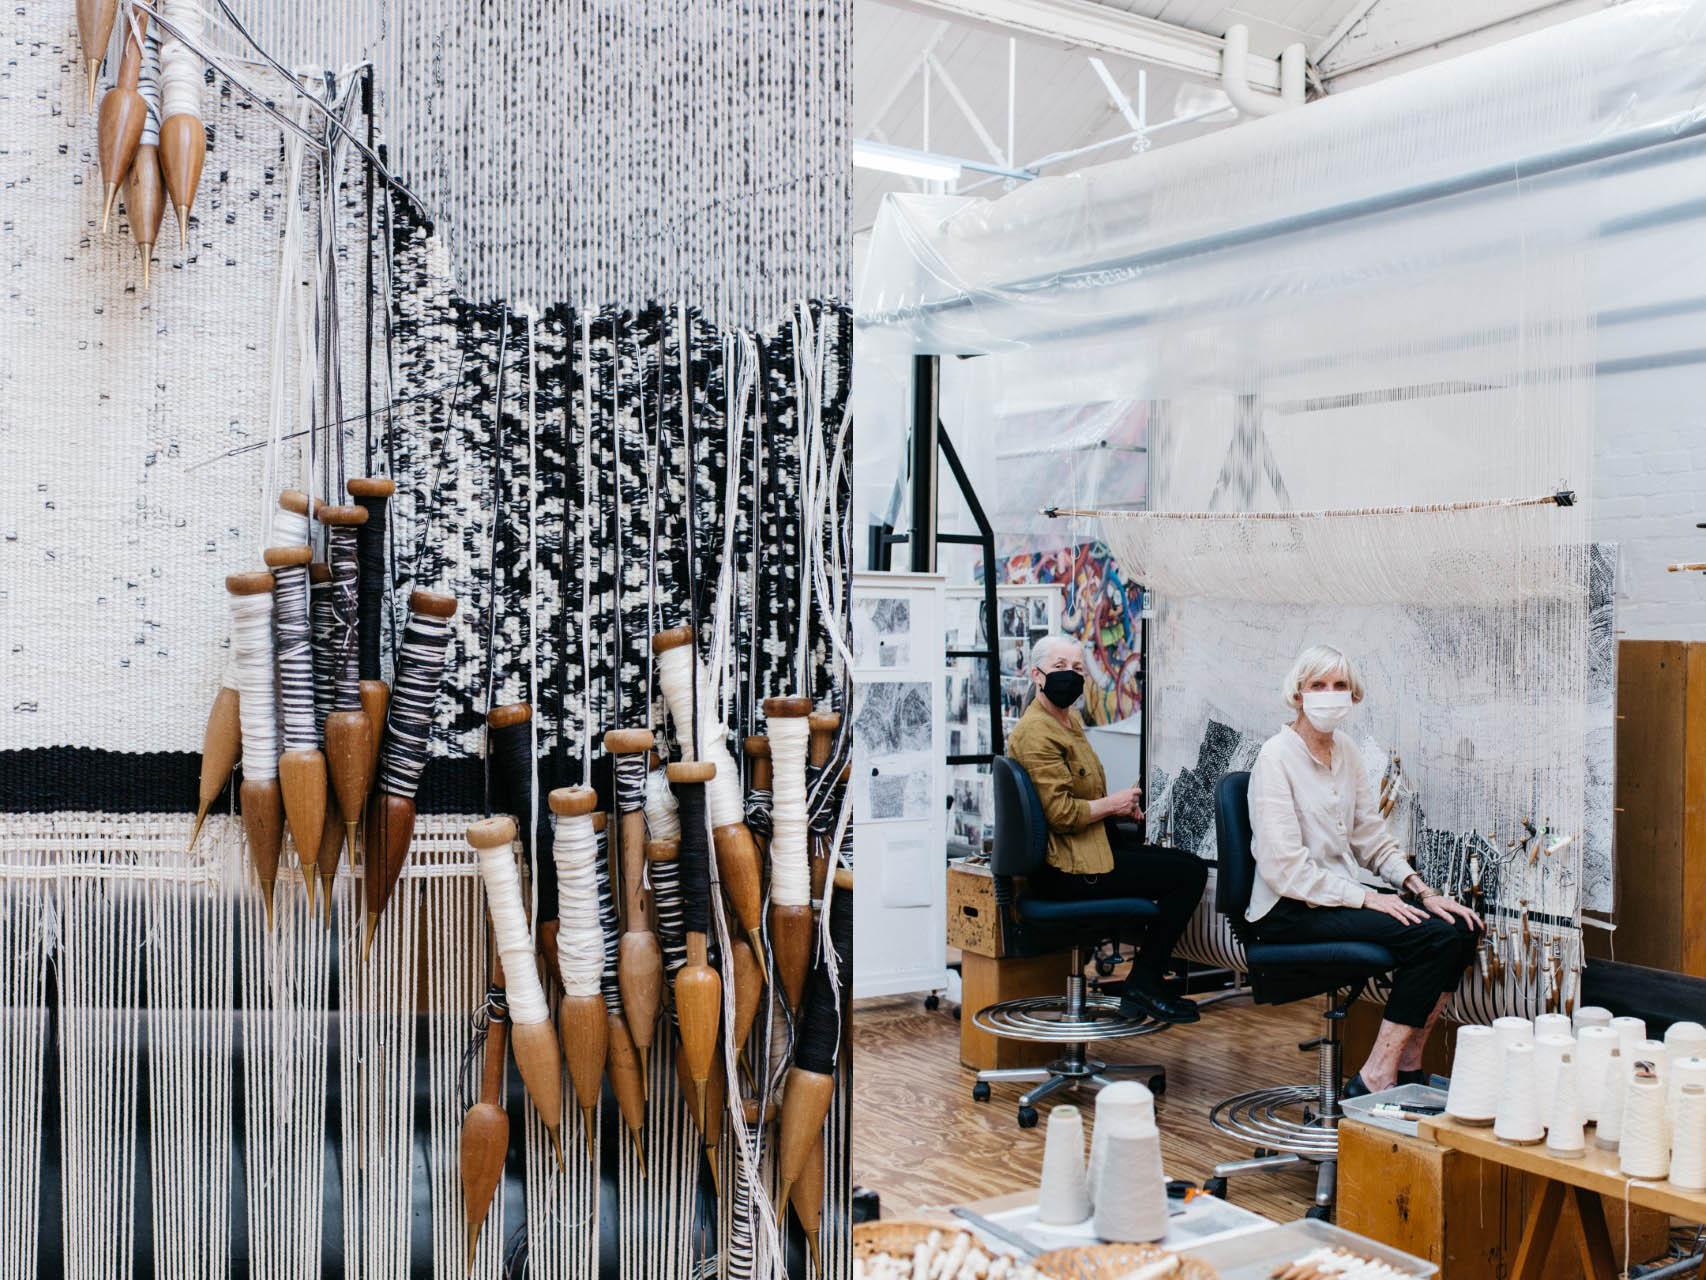 Left to right: Close up detail shot of 'Ilpili', designed by Kunmanara Carroll in 2021; ATW weavers Pamela Joyce & Cheryl Thornton working on 'Ilpili', designed by Pepai Jangala Carroll in 2021. Photos: Marie-Luise Skibbe.